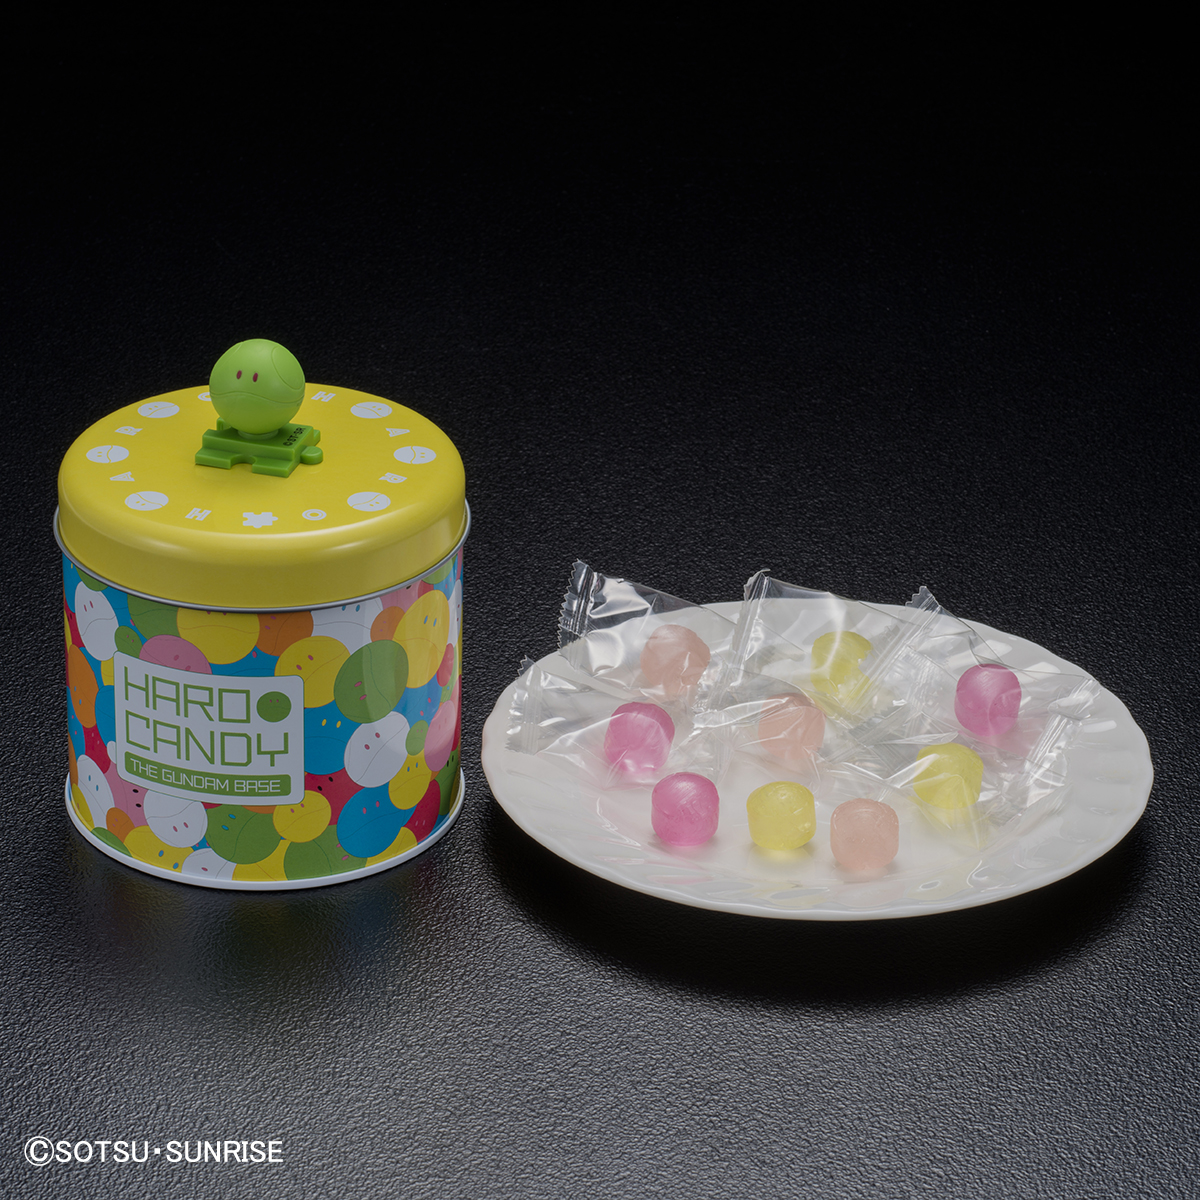 THE GUNDAM BASE ハロ缶キャンディ 商品画像